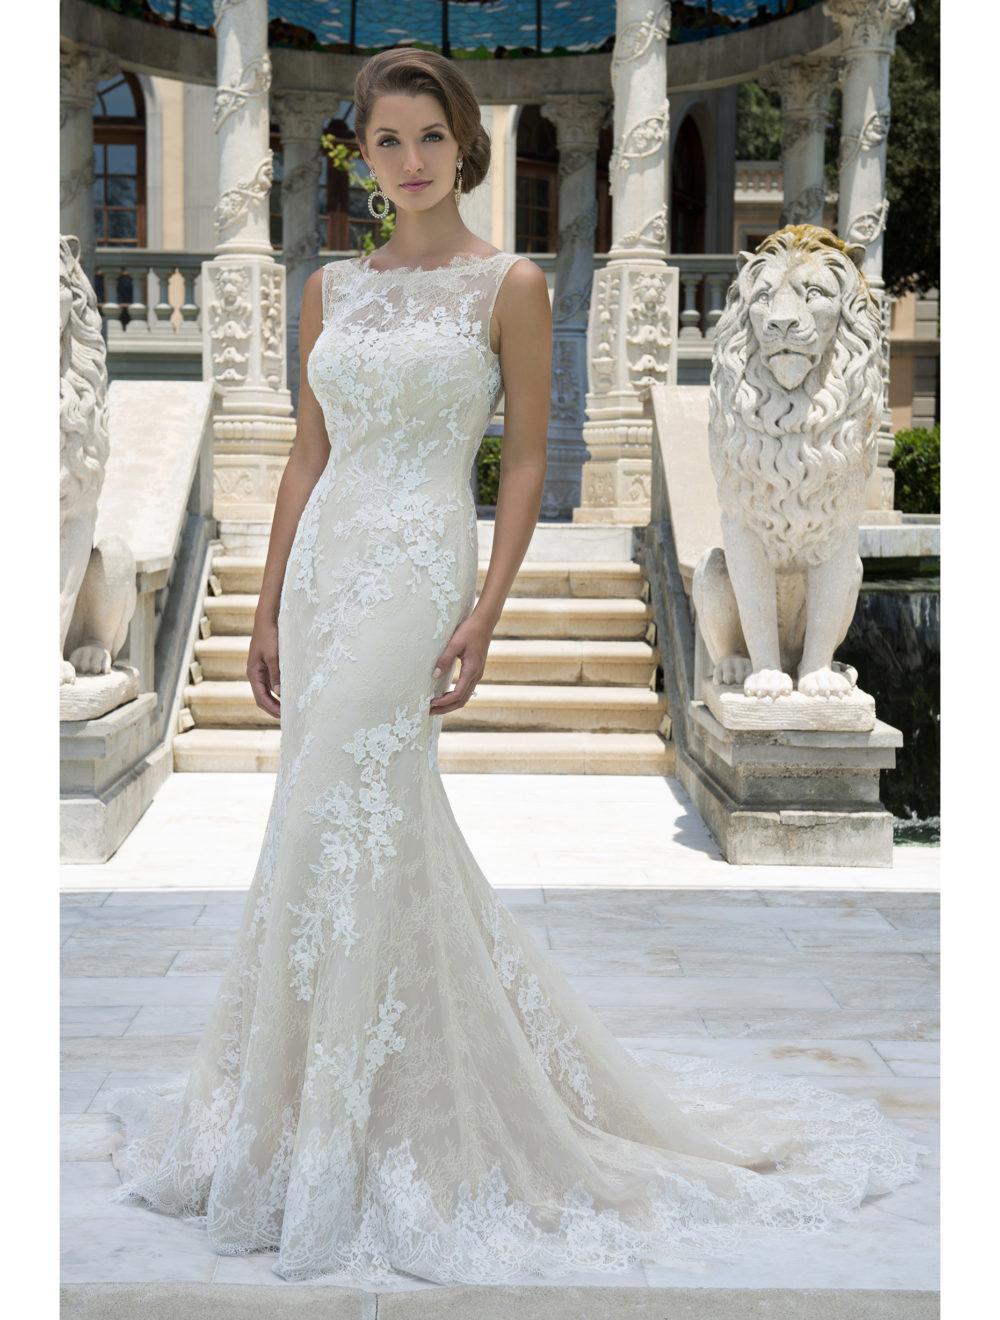 Dress VE8302N